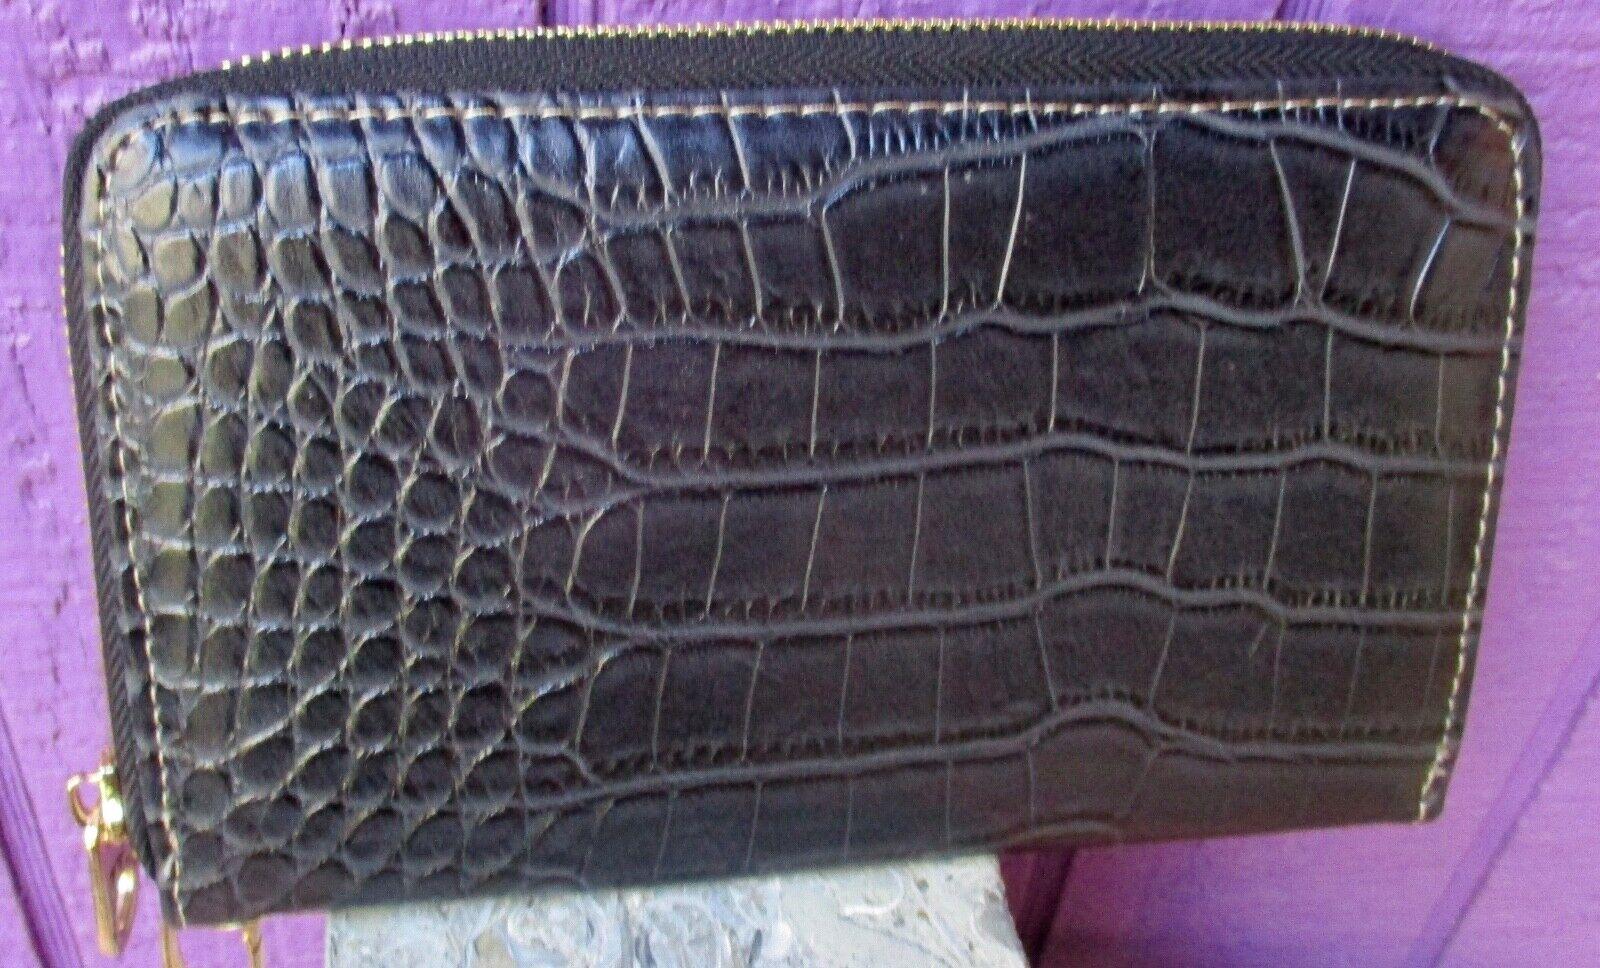 MONTANA WEST Croc Print Collection Wristlet Clutch Wallet Zip Around